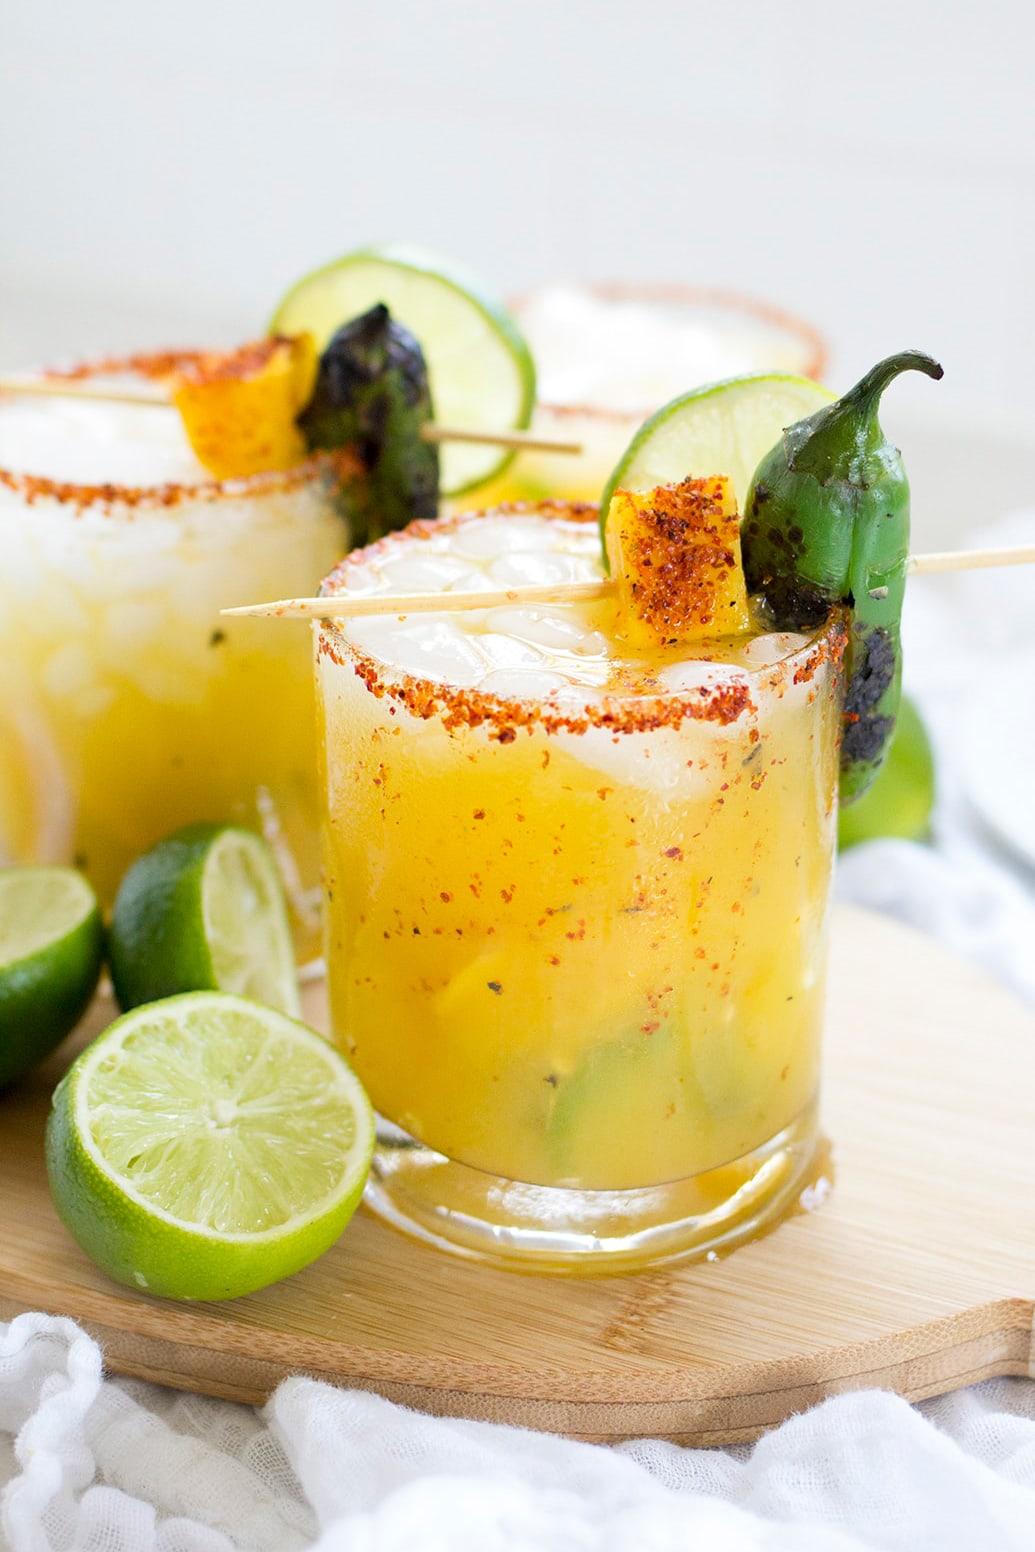 Spicy Mango Jalapeno Margarita